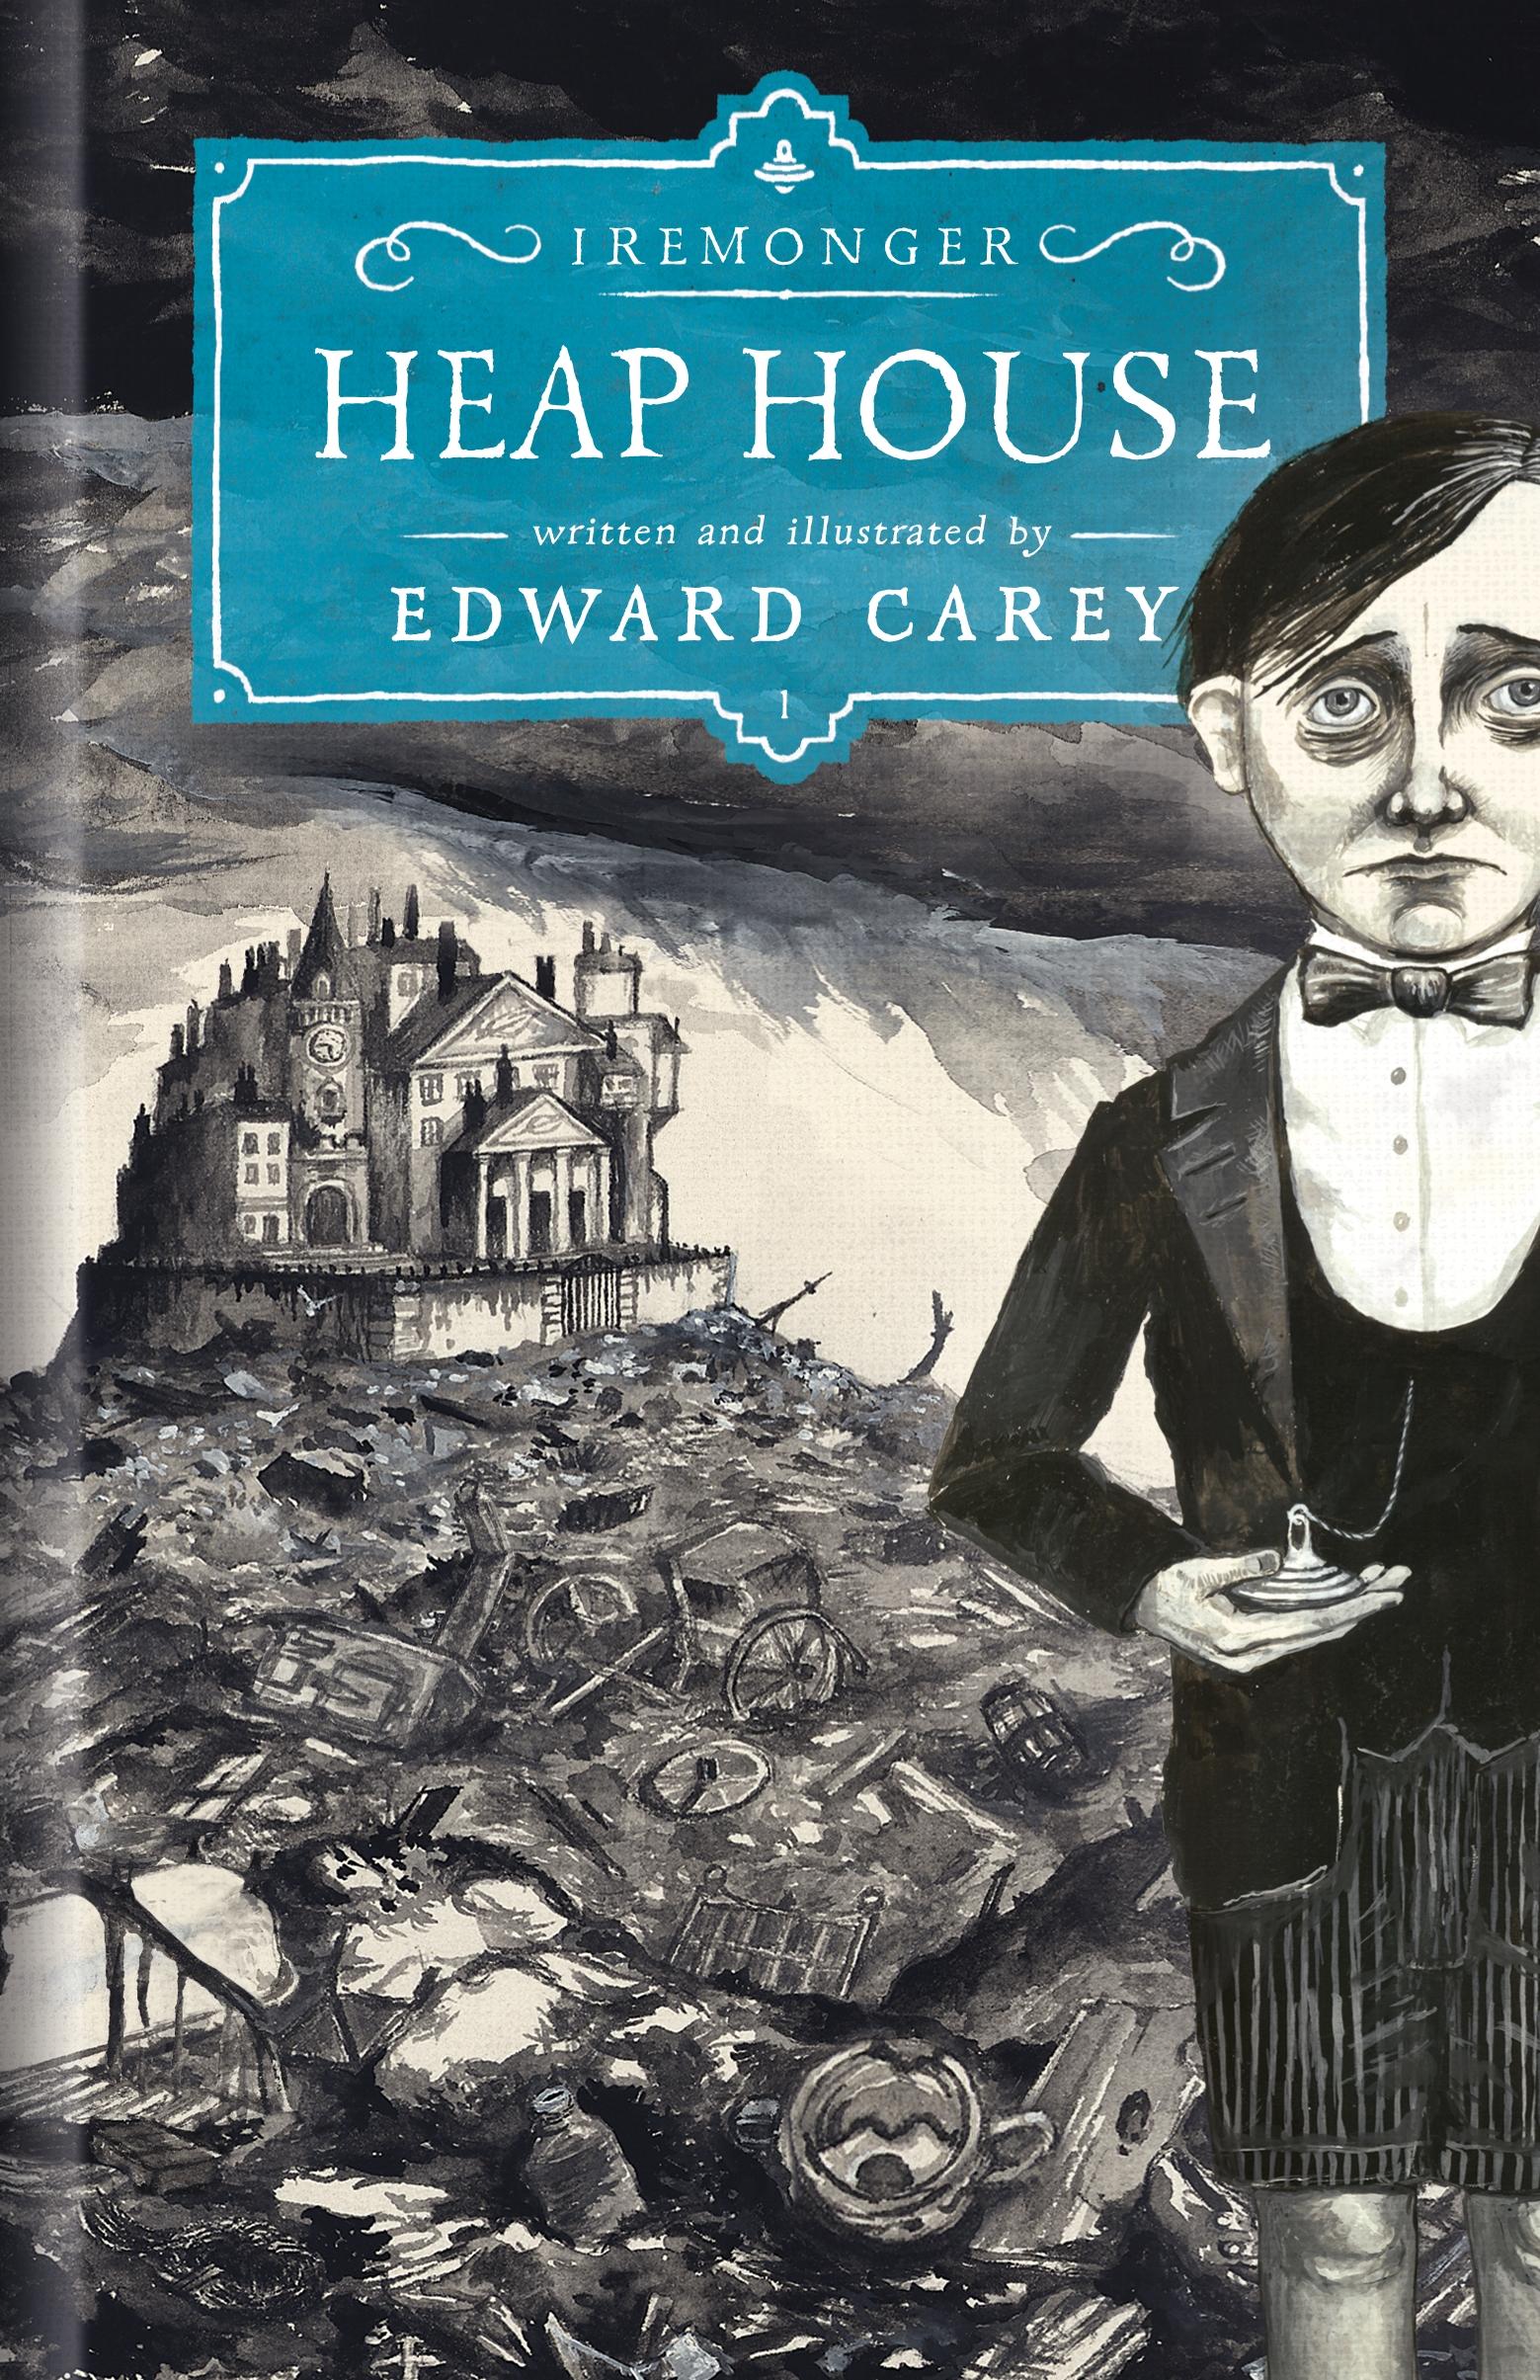 Heap House by Edward Carey